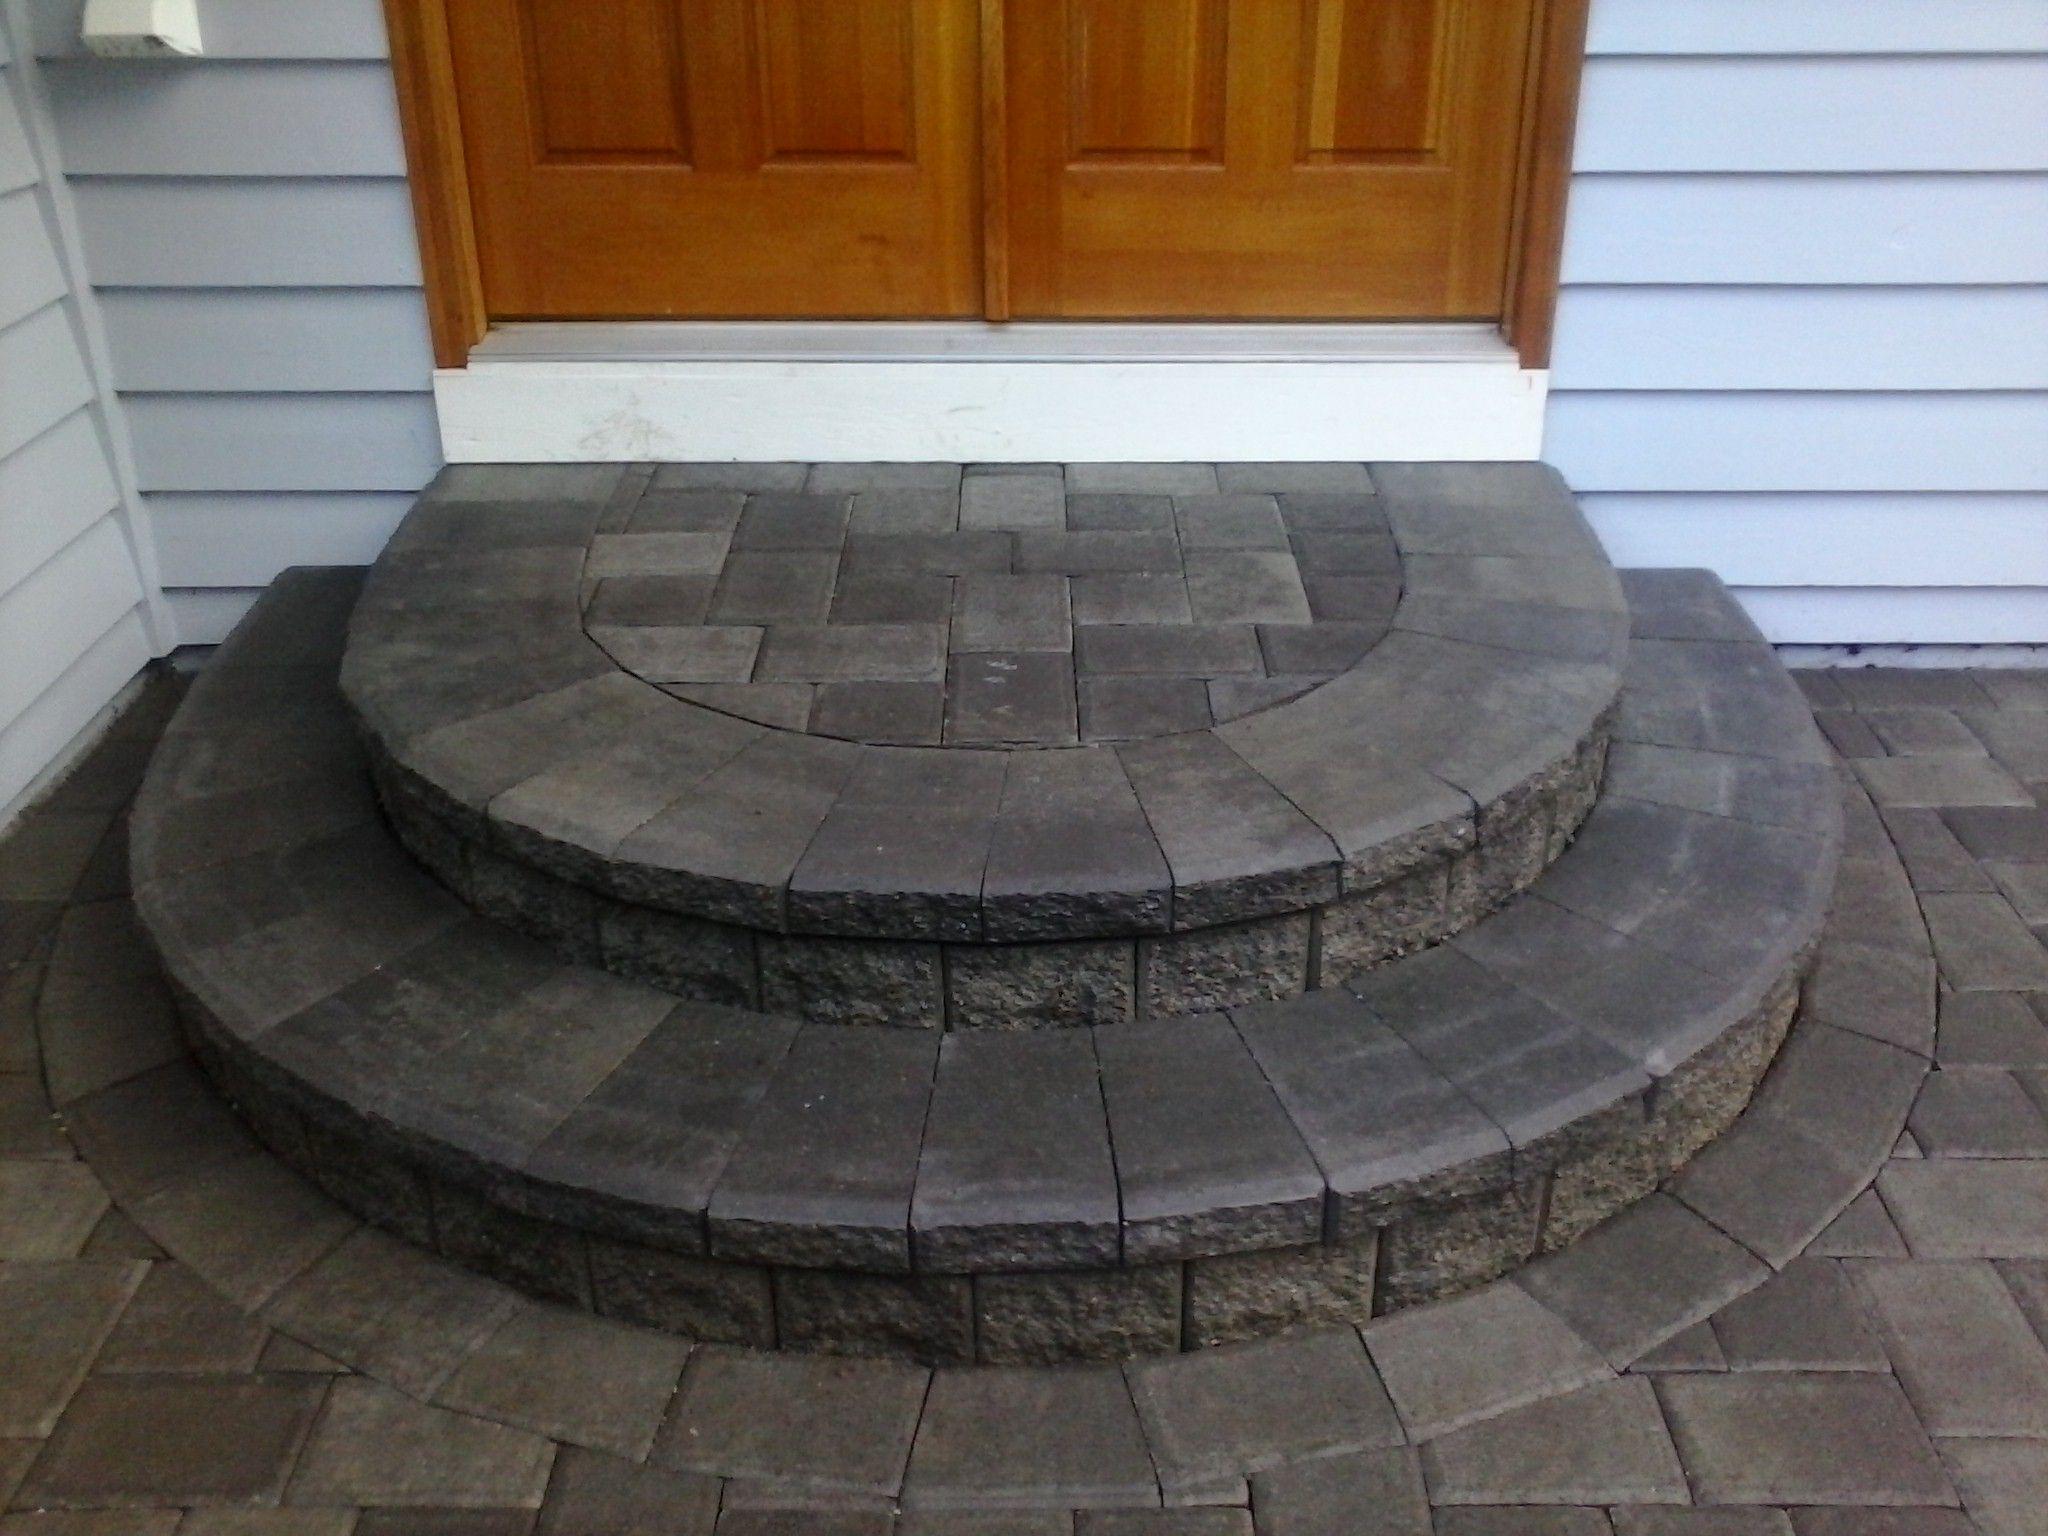 Pin By Sdp Seattle Driveway Patio On Interlocking Paver Patios | Half Moon Wood Steps | Wooden | Hexagon | Diy | Outside Corner Deck | Exterior